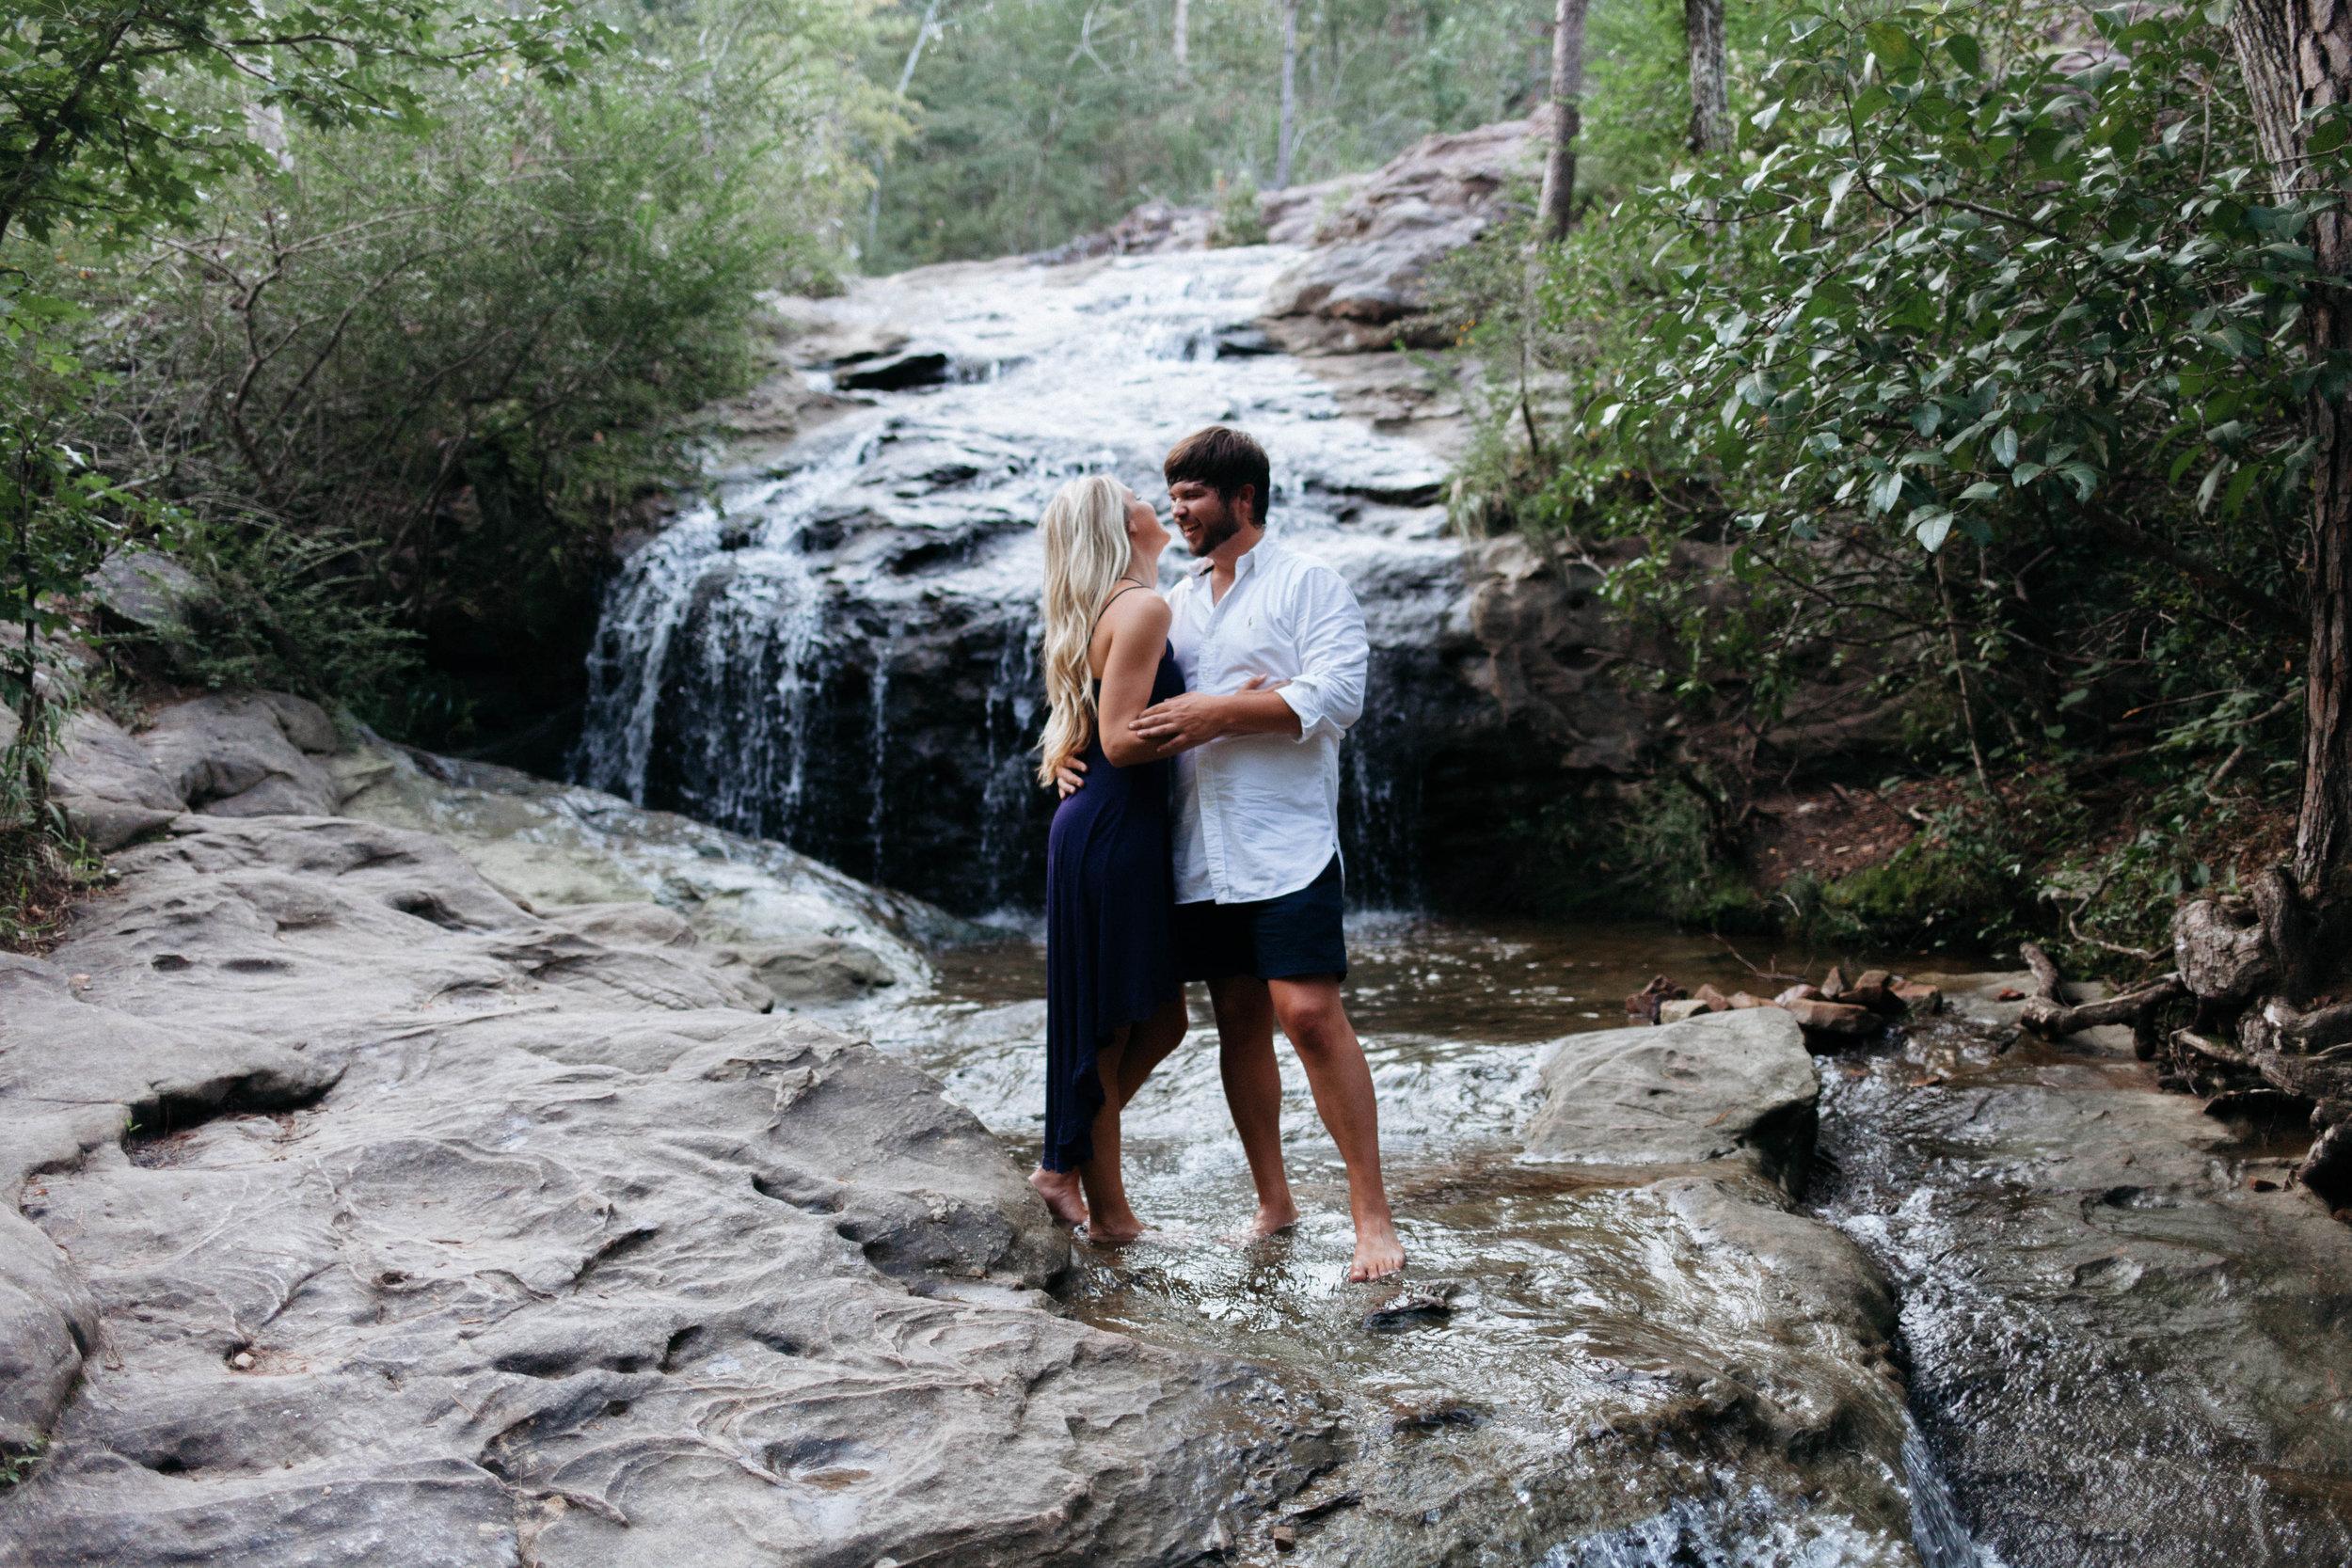 Dustin + Sarah - Takin' a dip in the waterfall